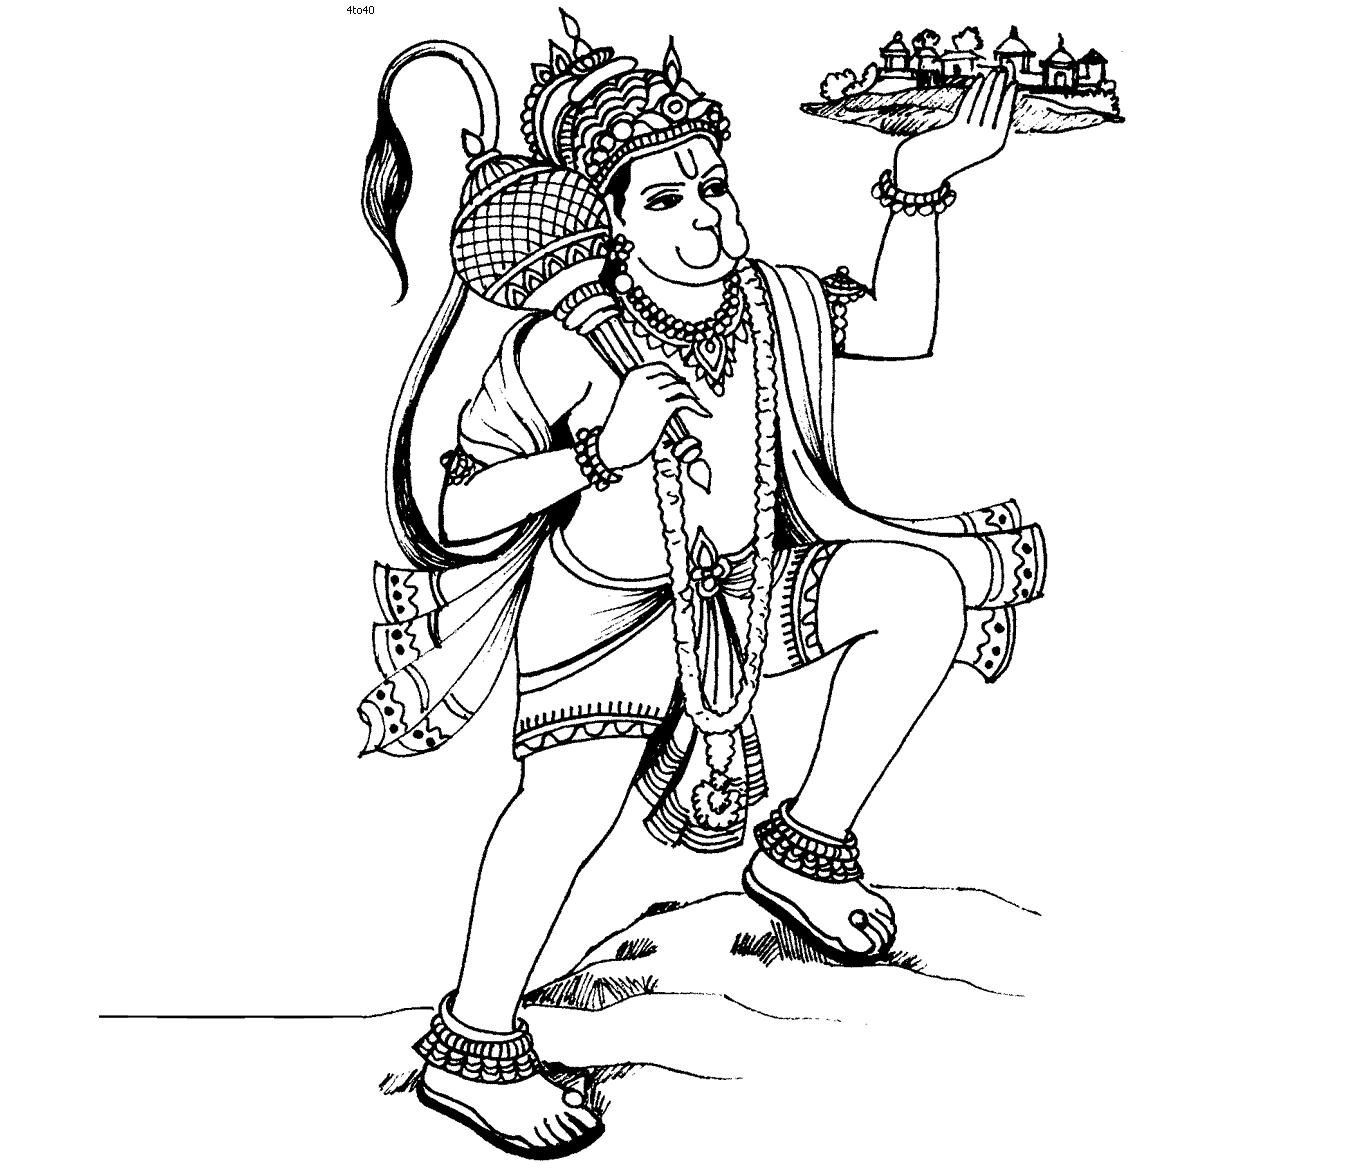 Hanuman Drawing at GetDrawings com | Free for personal use